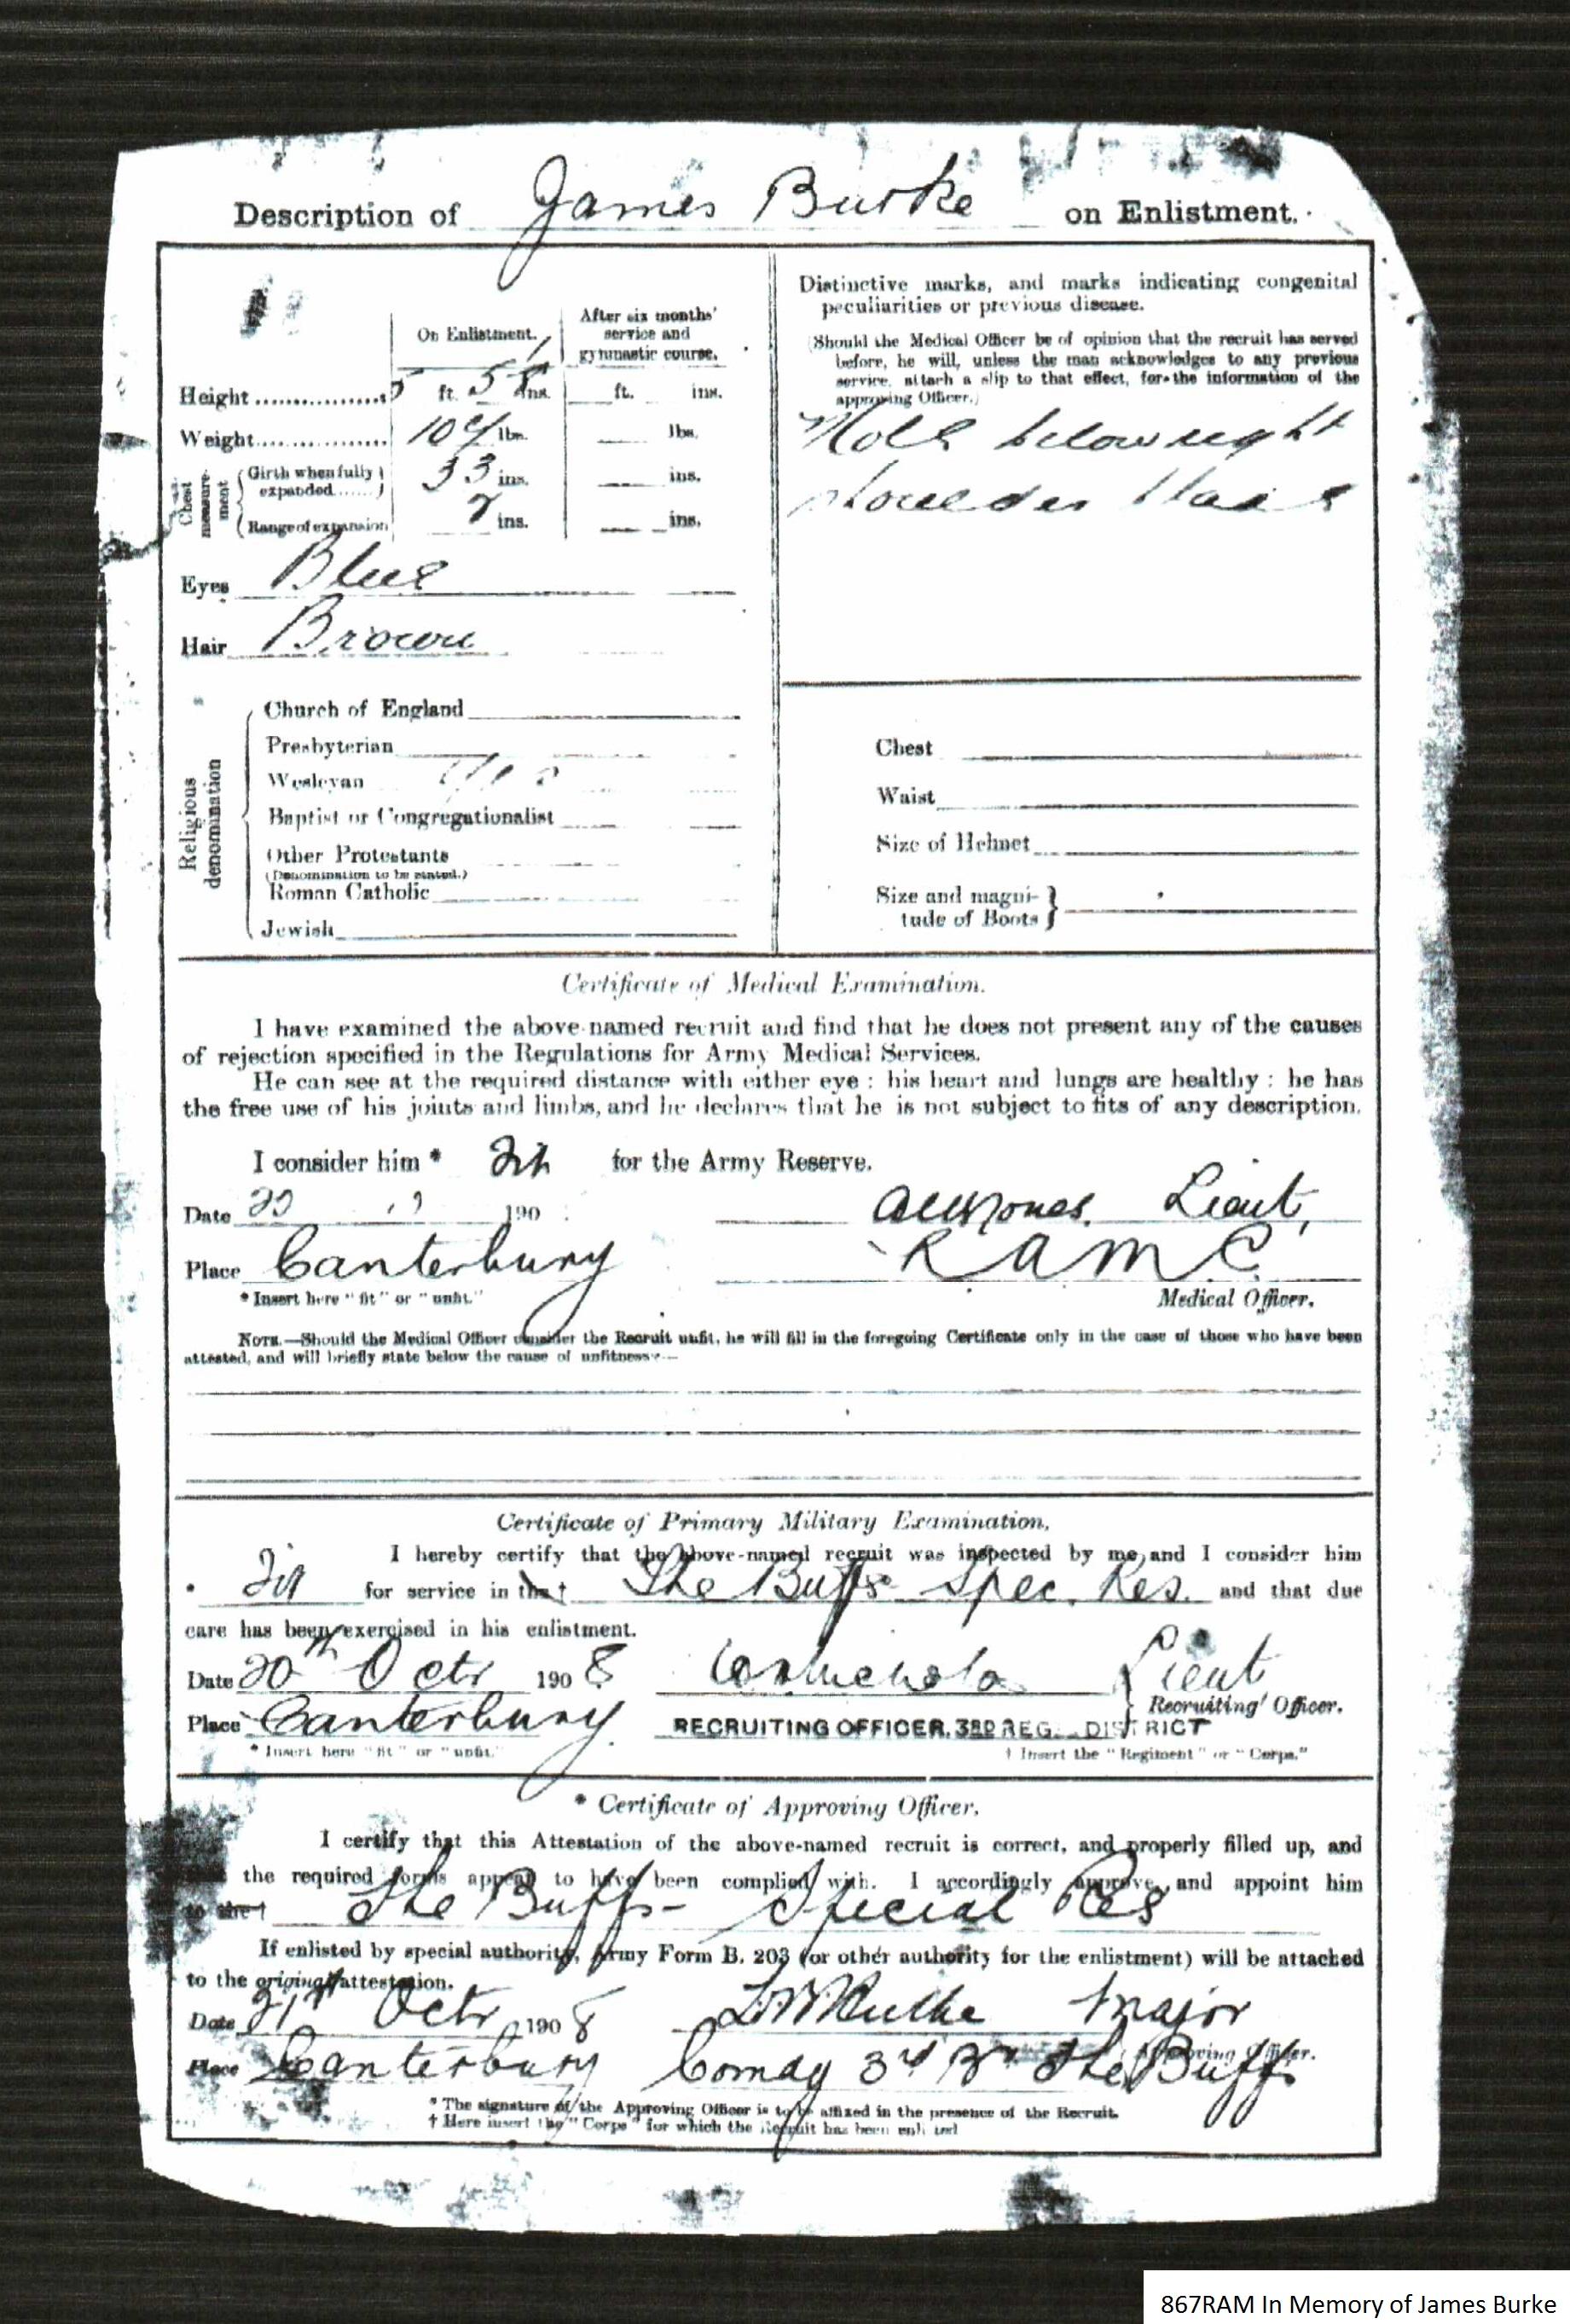 James Burke's Enlistment